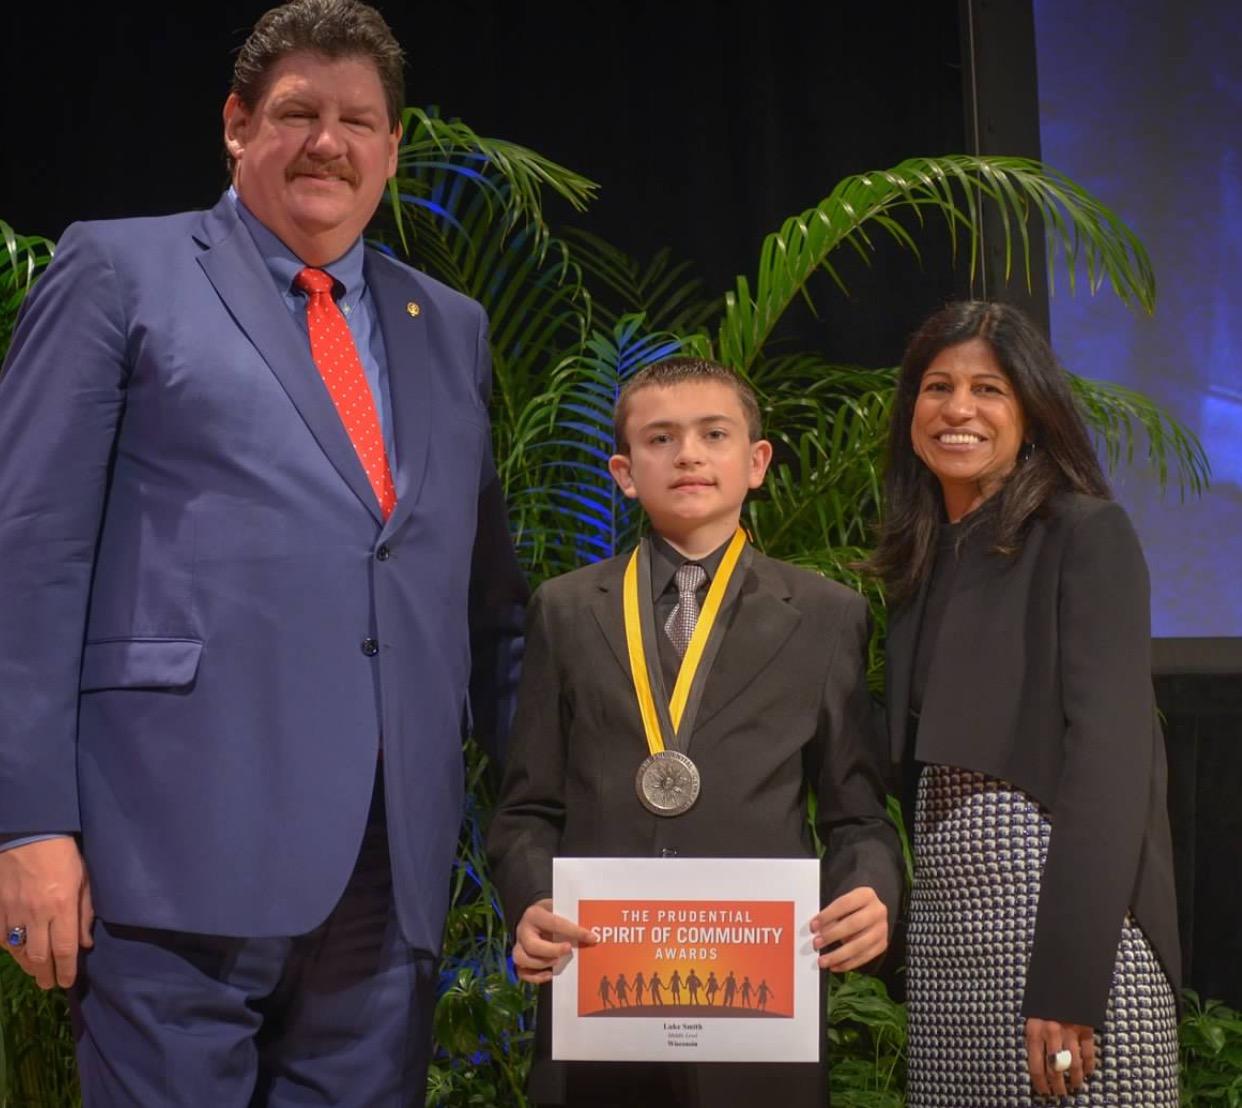 Lucas Smith: Prudential Community of Spirit Award